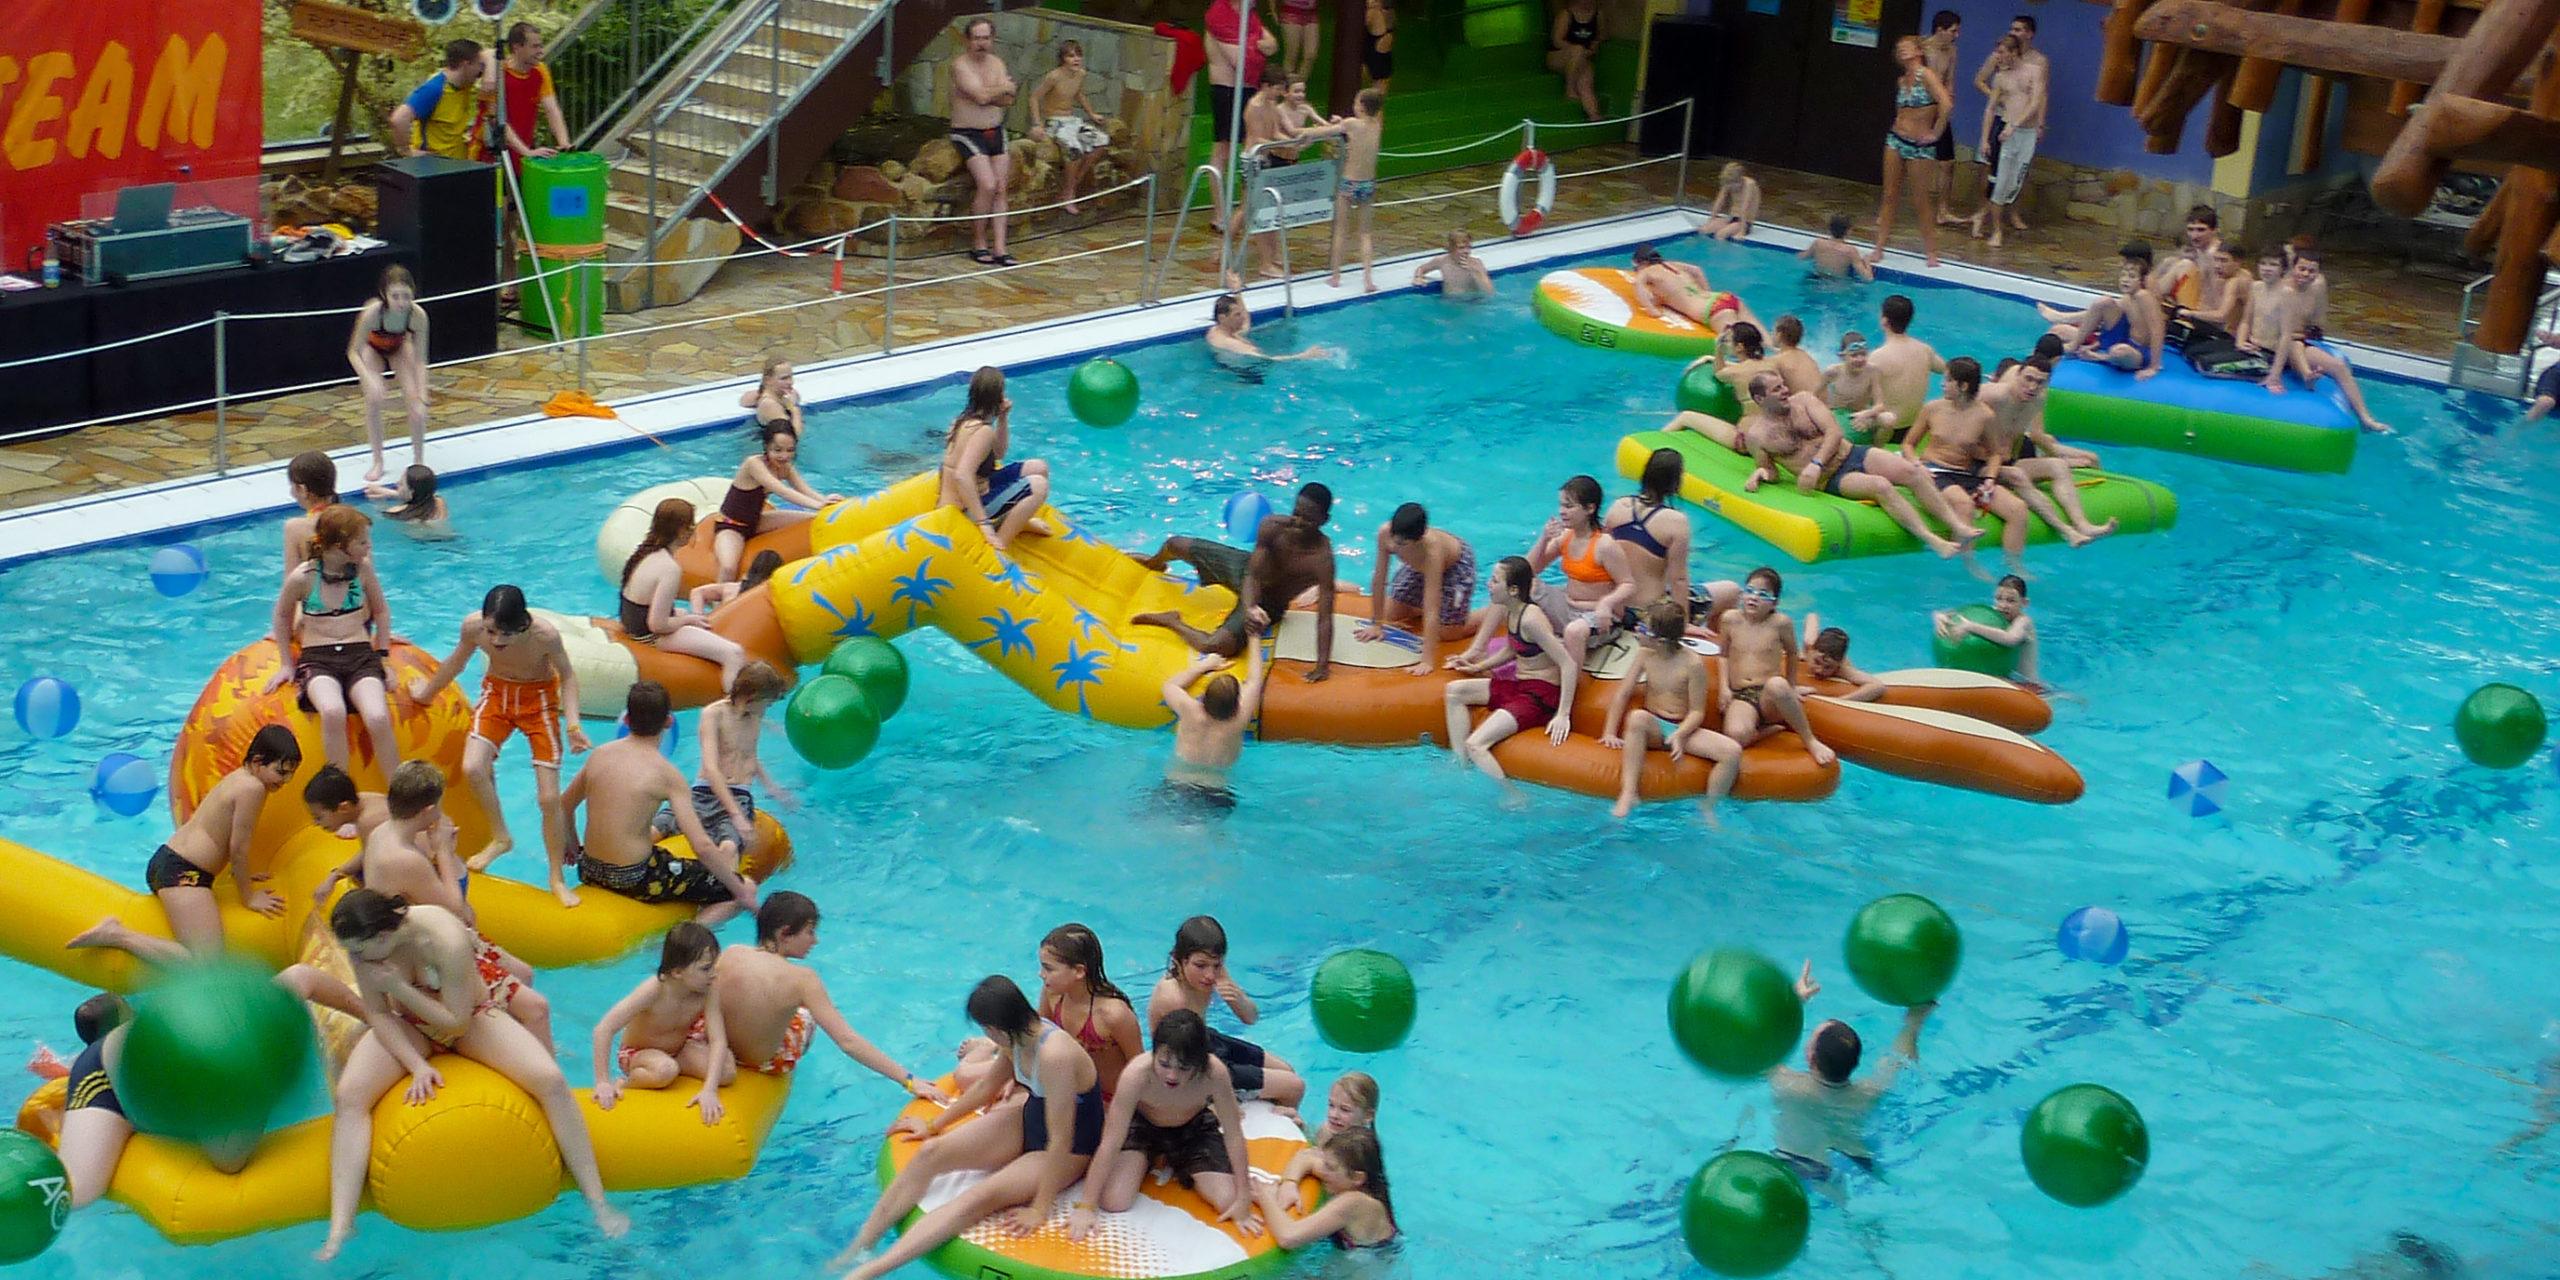 Poolparty im Tropicana Stadthagen